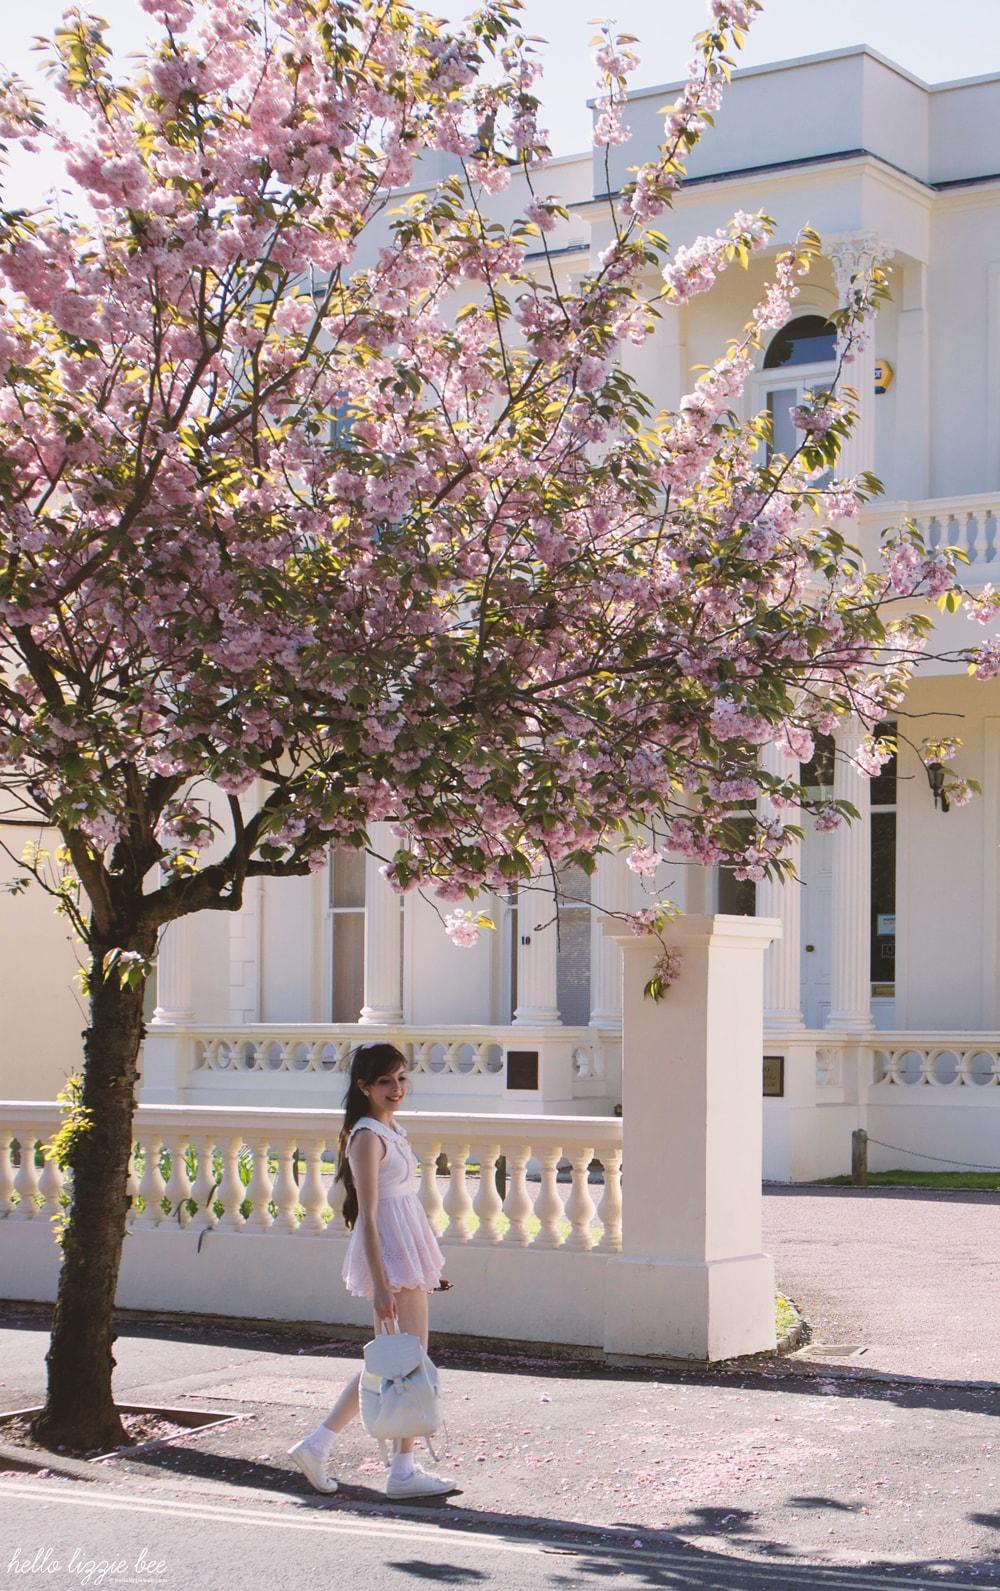 leamington spa, cherry blossoms